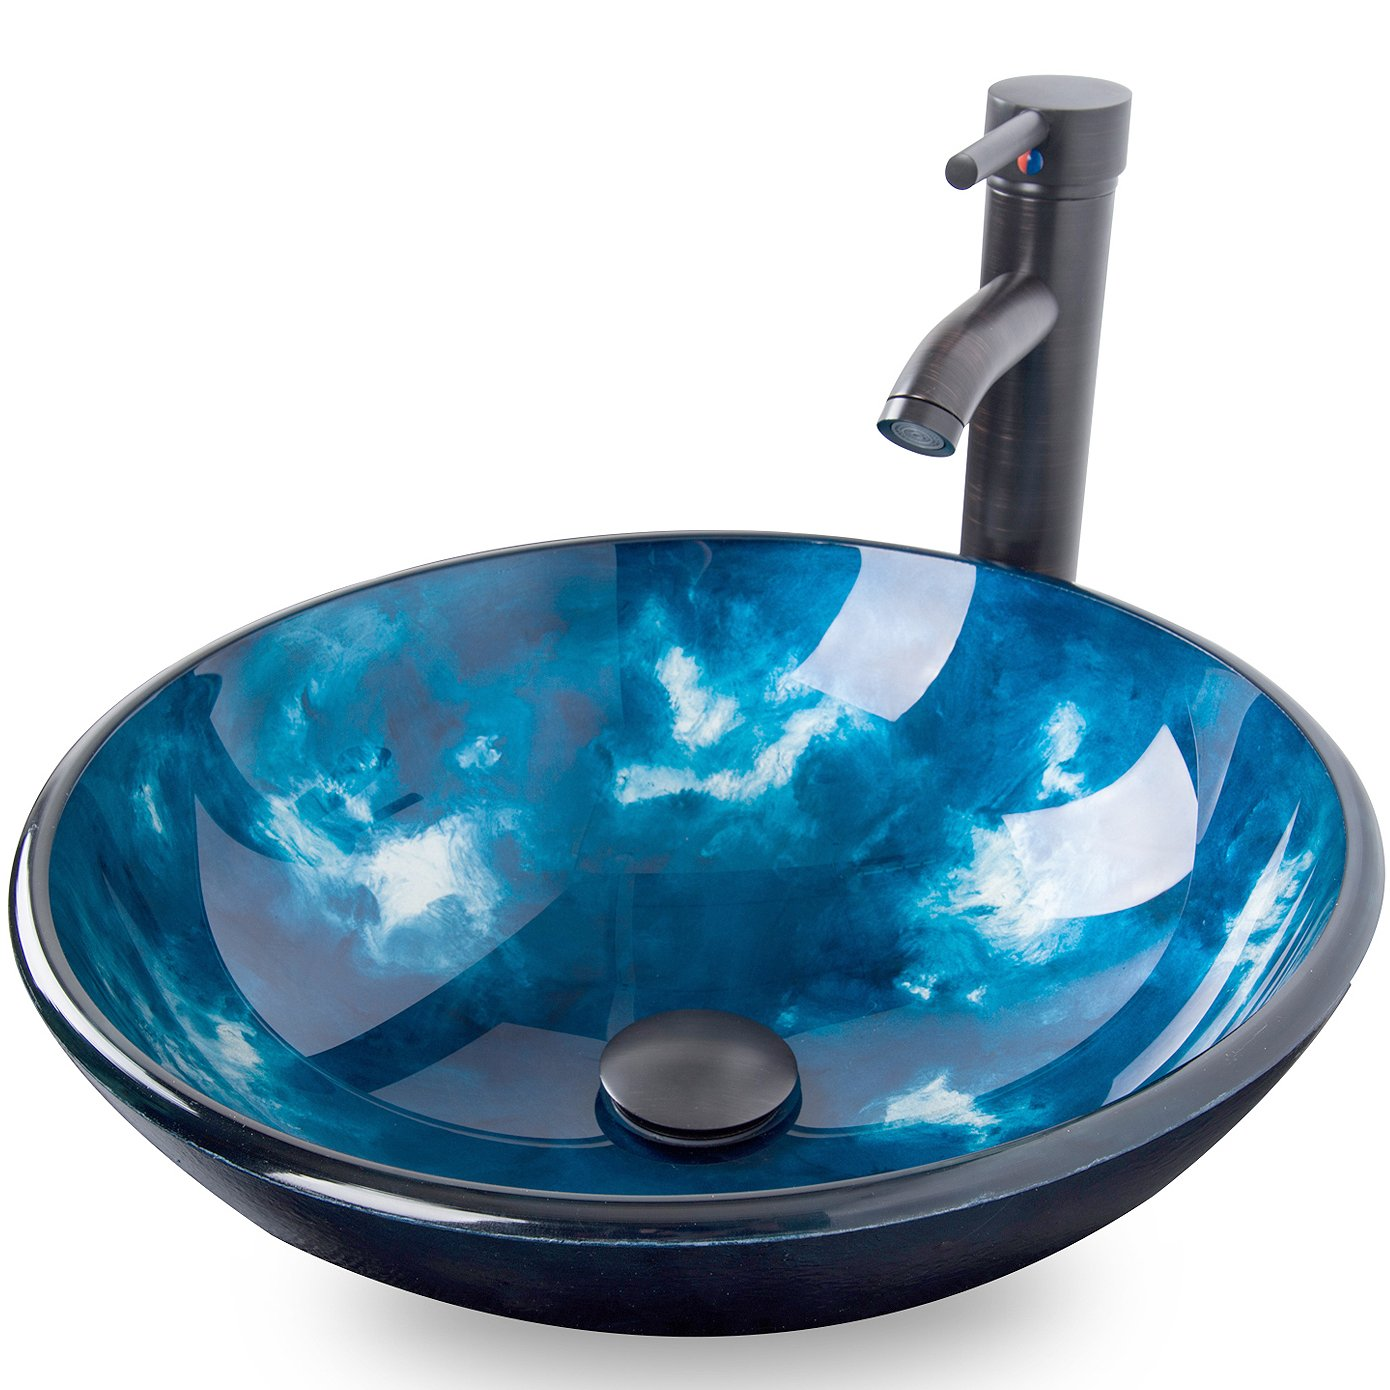 4. Elecwish Bathroom Artistic Glass Vessel Sink